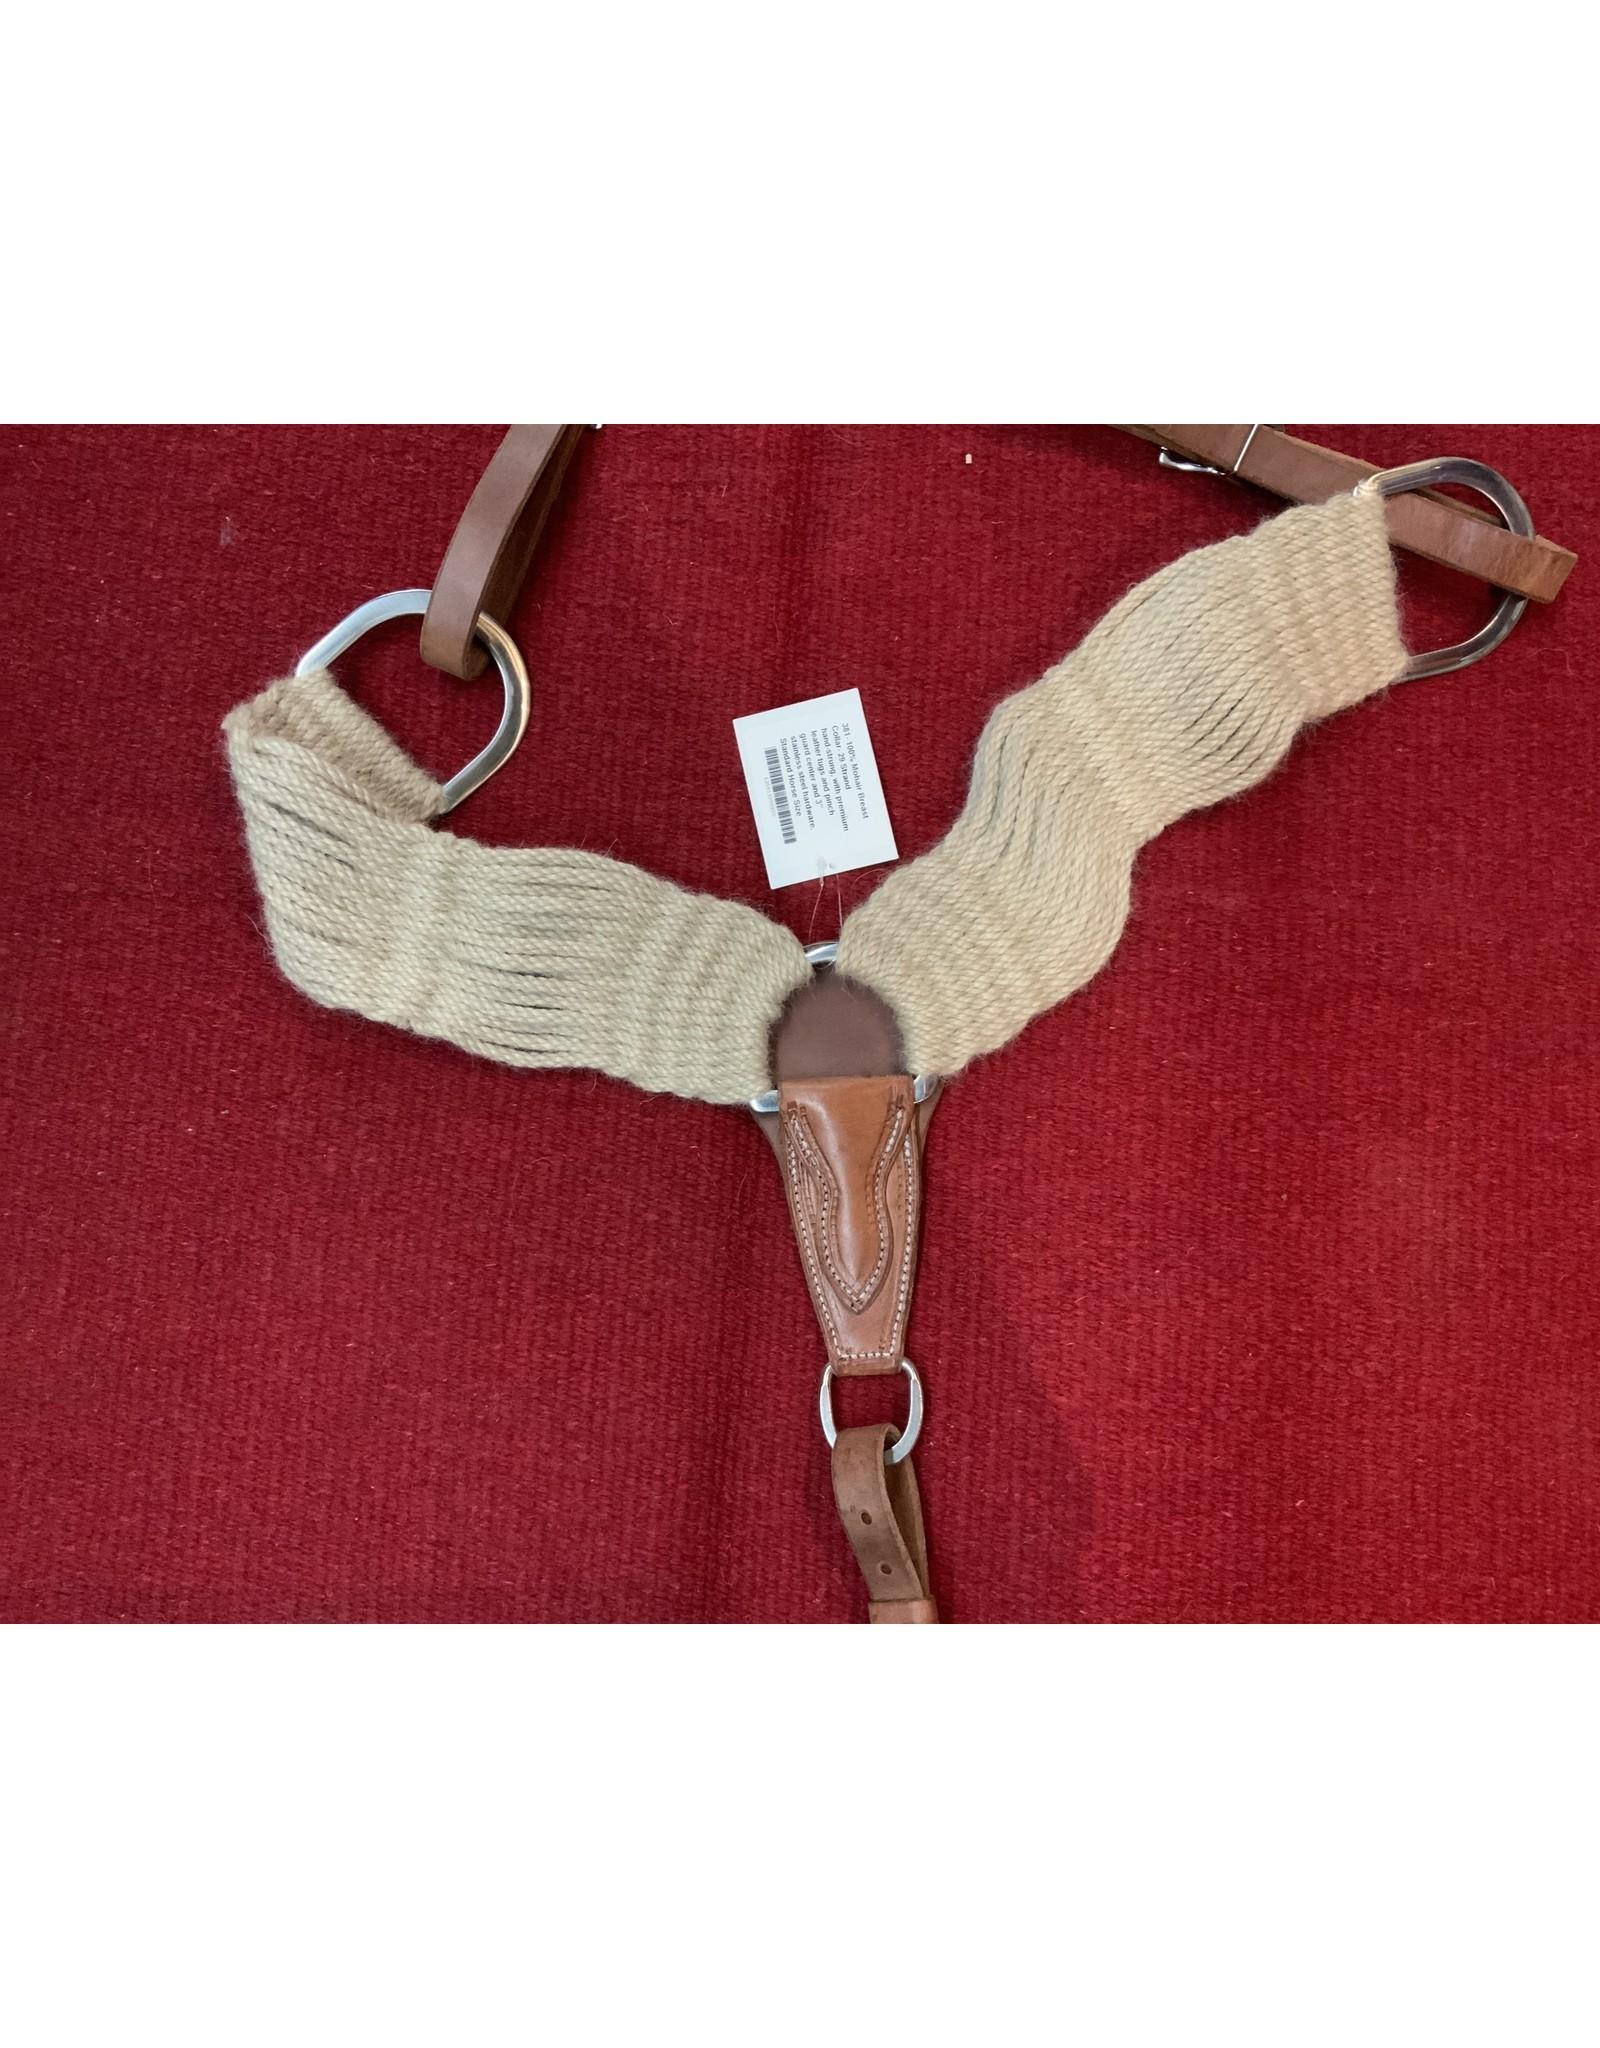 BB* 100% Mohair Breast Collar 29 strand 202077-11